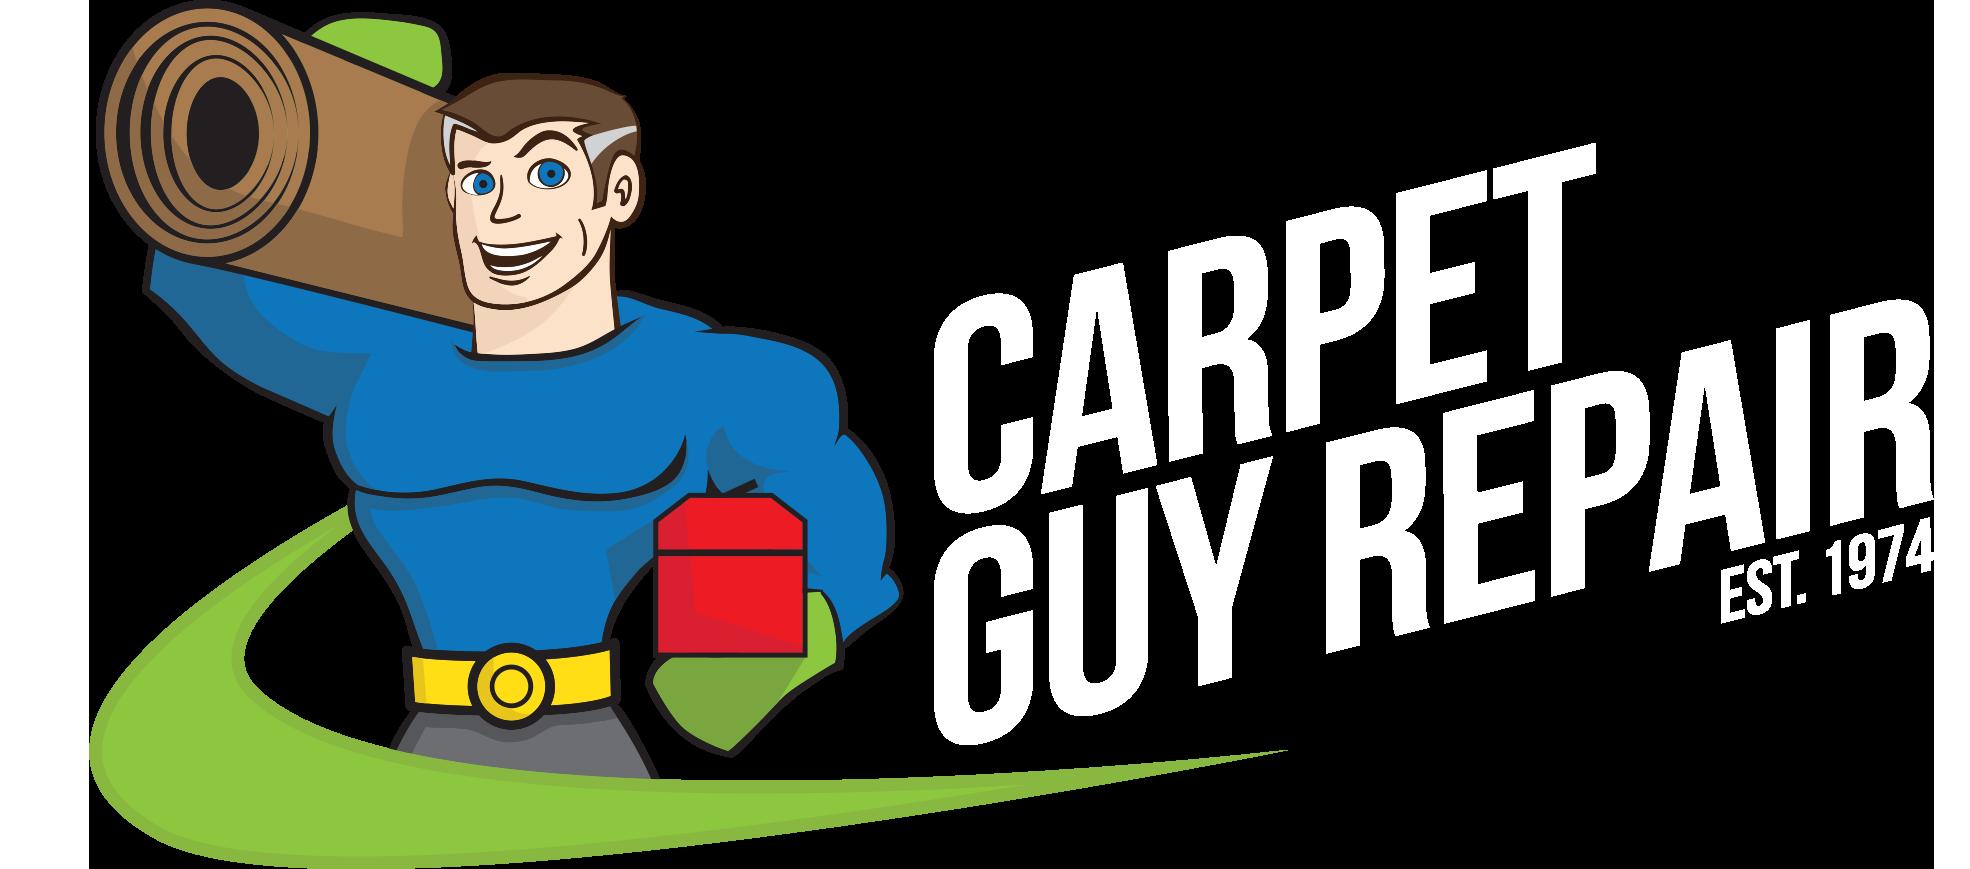 Home carpet guy repair. Contractor clipart maintenance